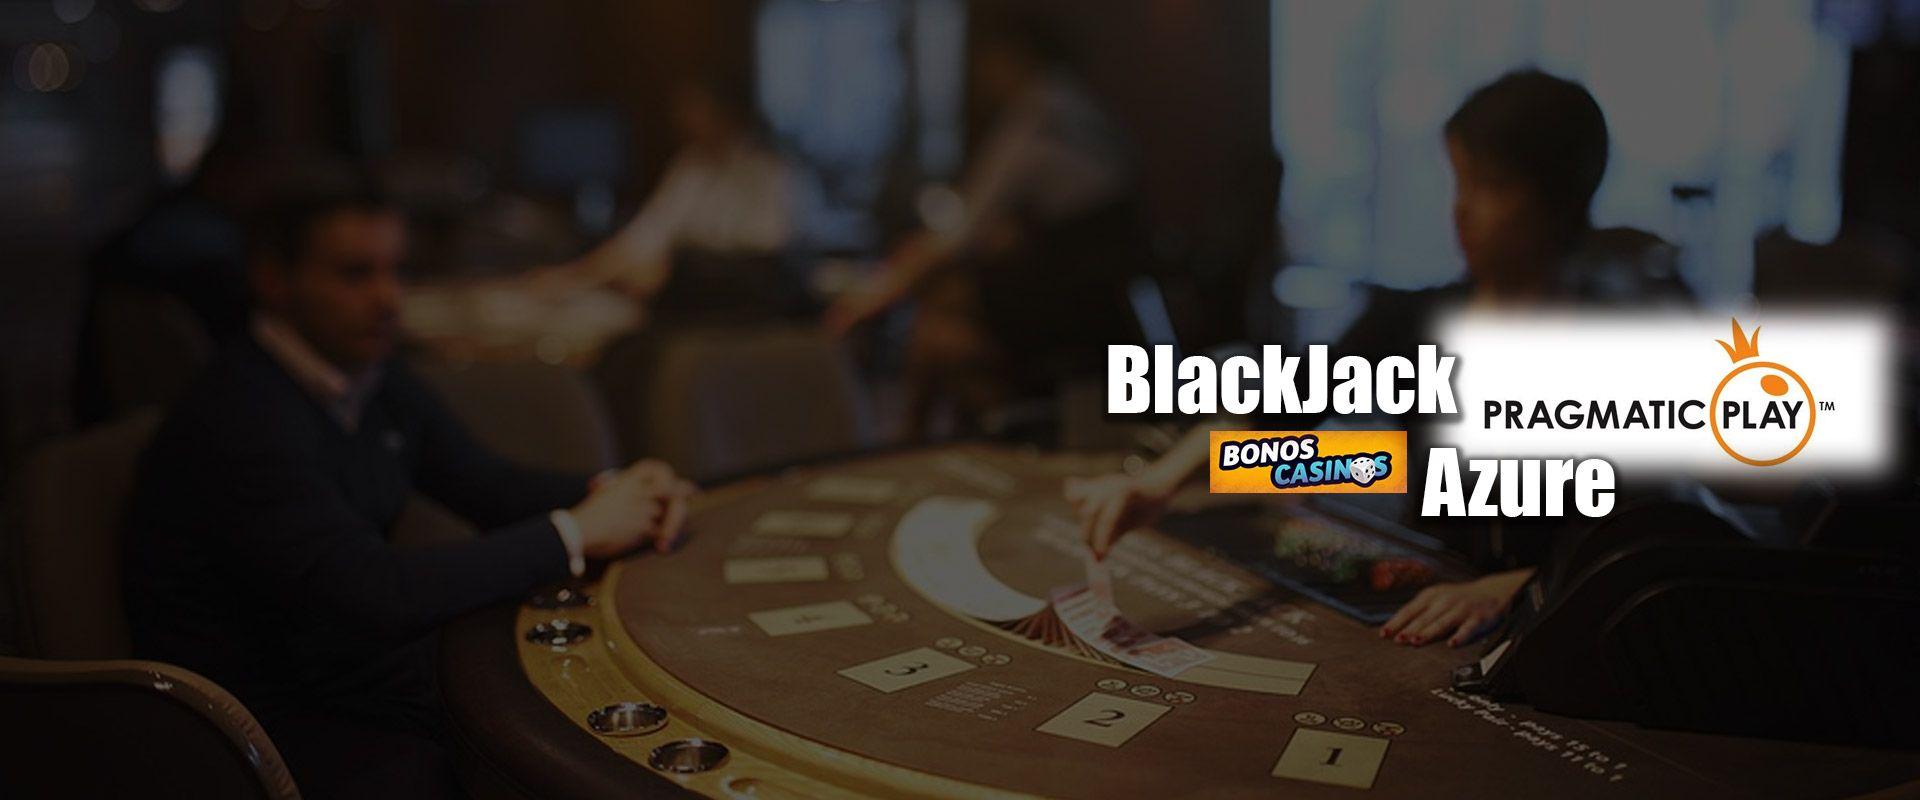 logo de La línea de BlackJack Azure de Pragmatic Play crece